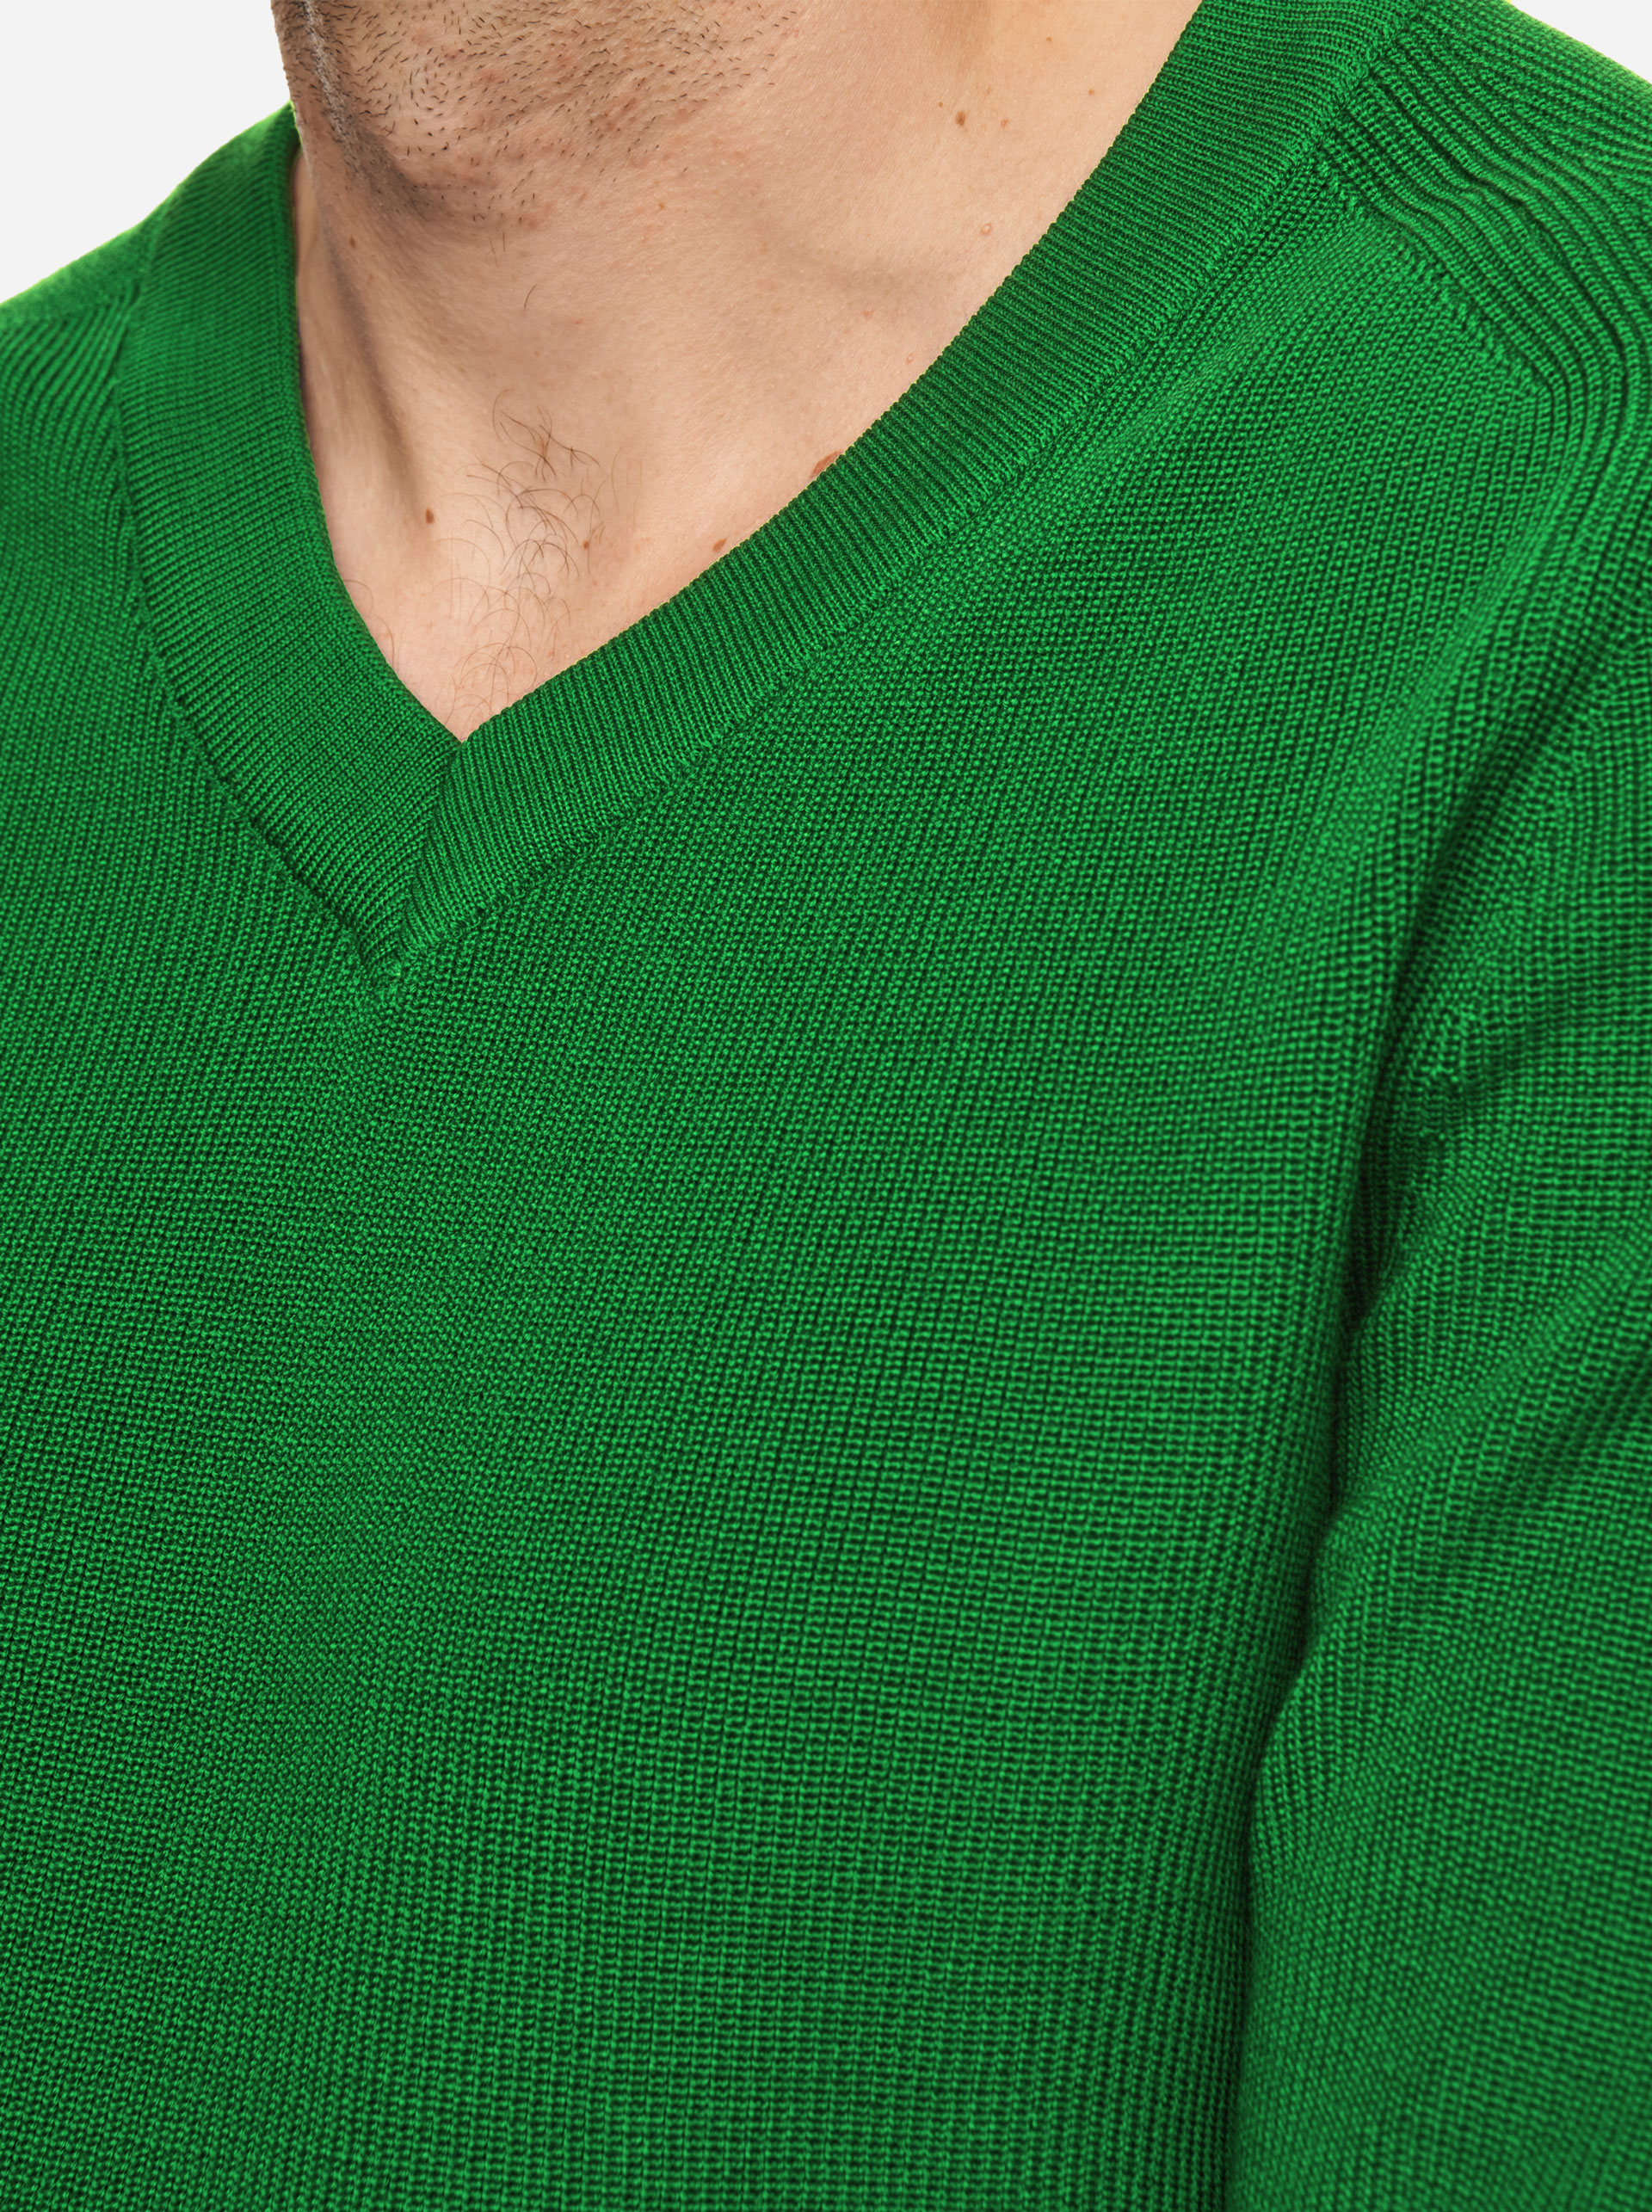 Teym - V-Neck - The Merino Sweater - Men - Bright Green - 3